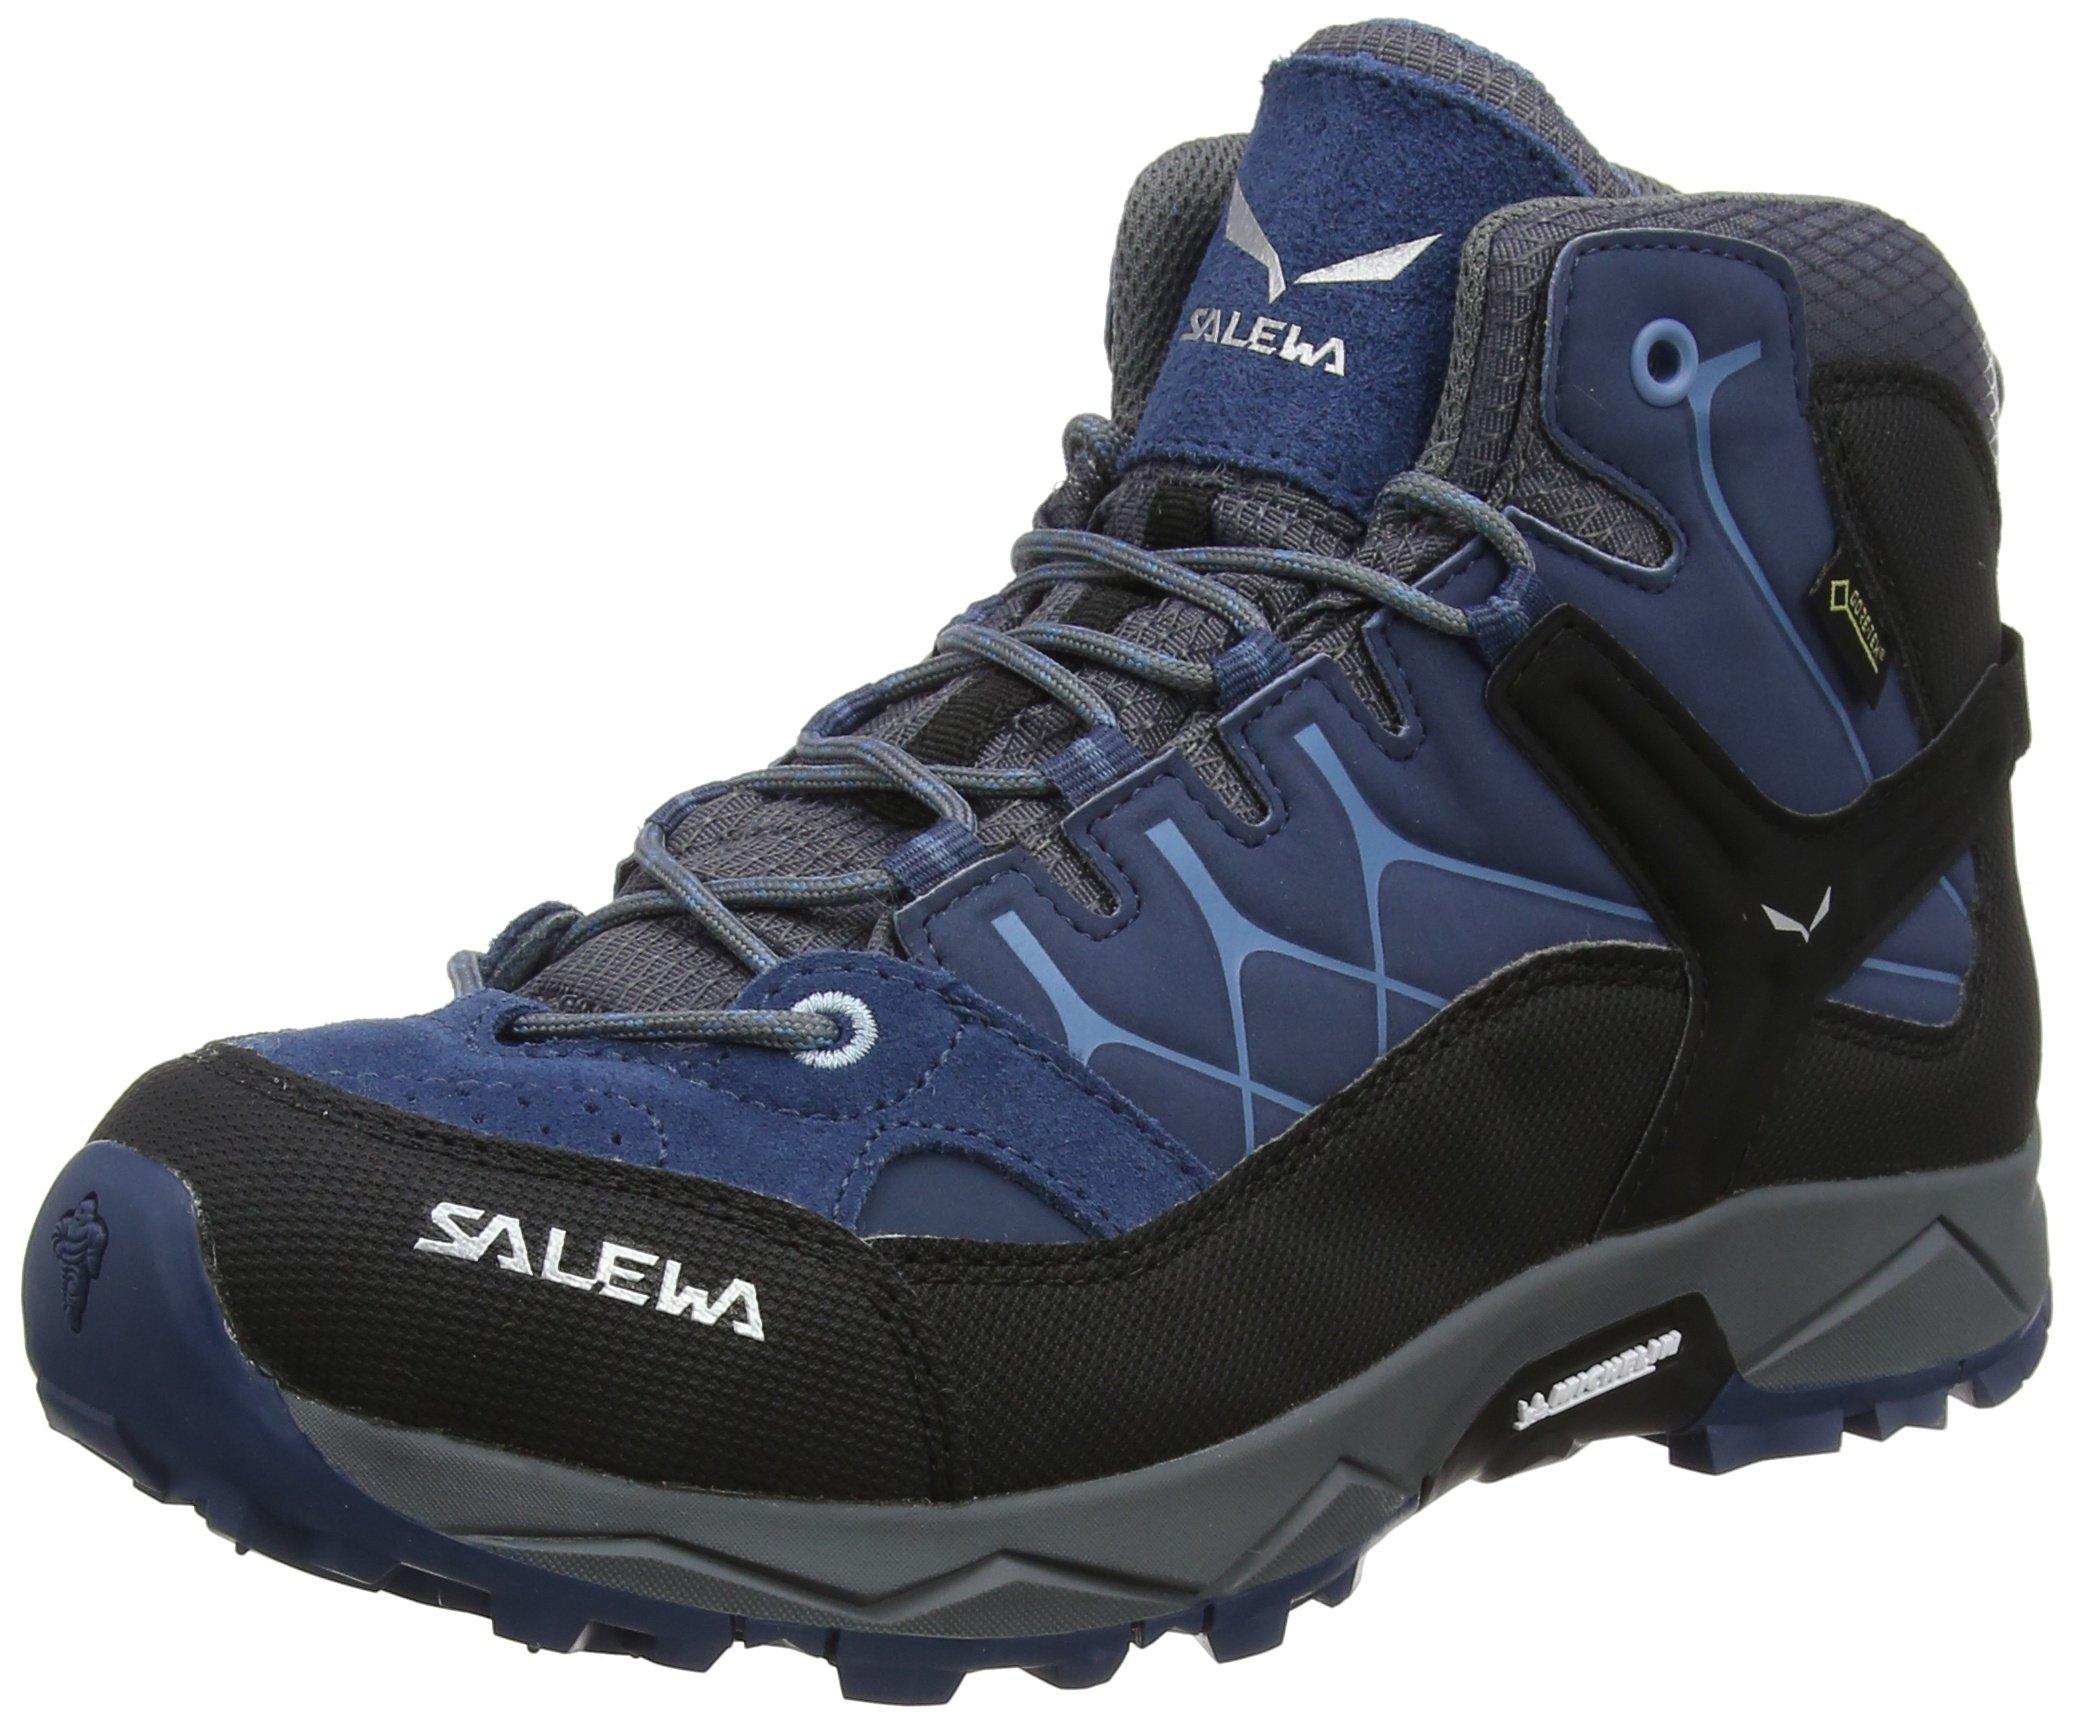 c4d2cbfc6ace Salewa Unisex-Kinder Jr Alp Trainer Mid GTX Trekking-  Wanderstiefel  product image